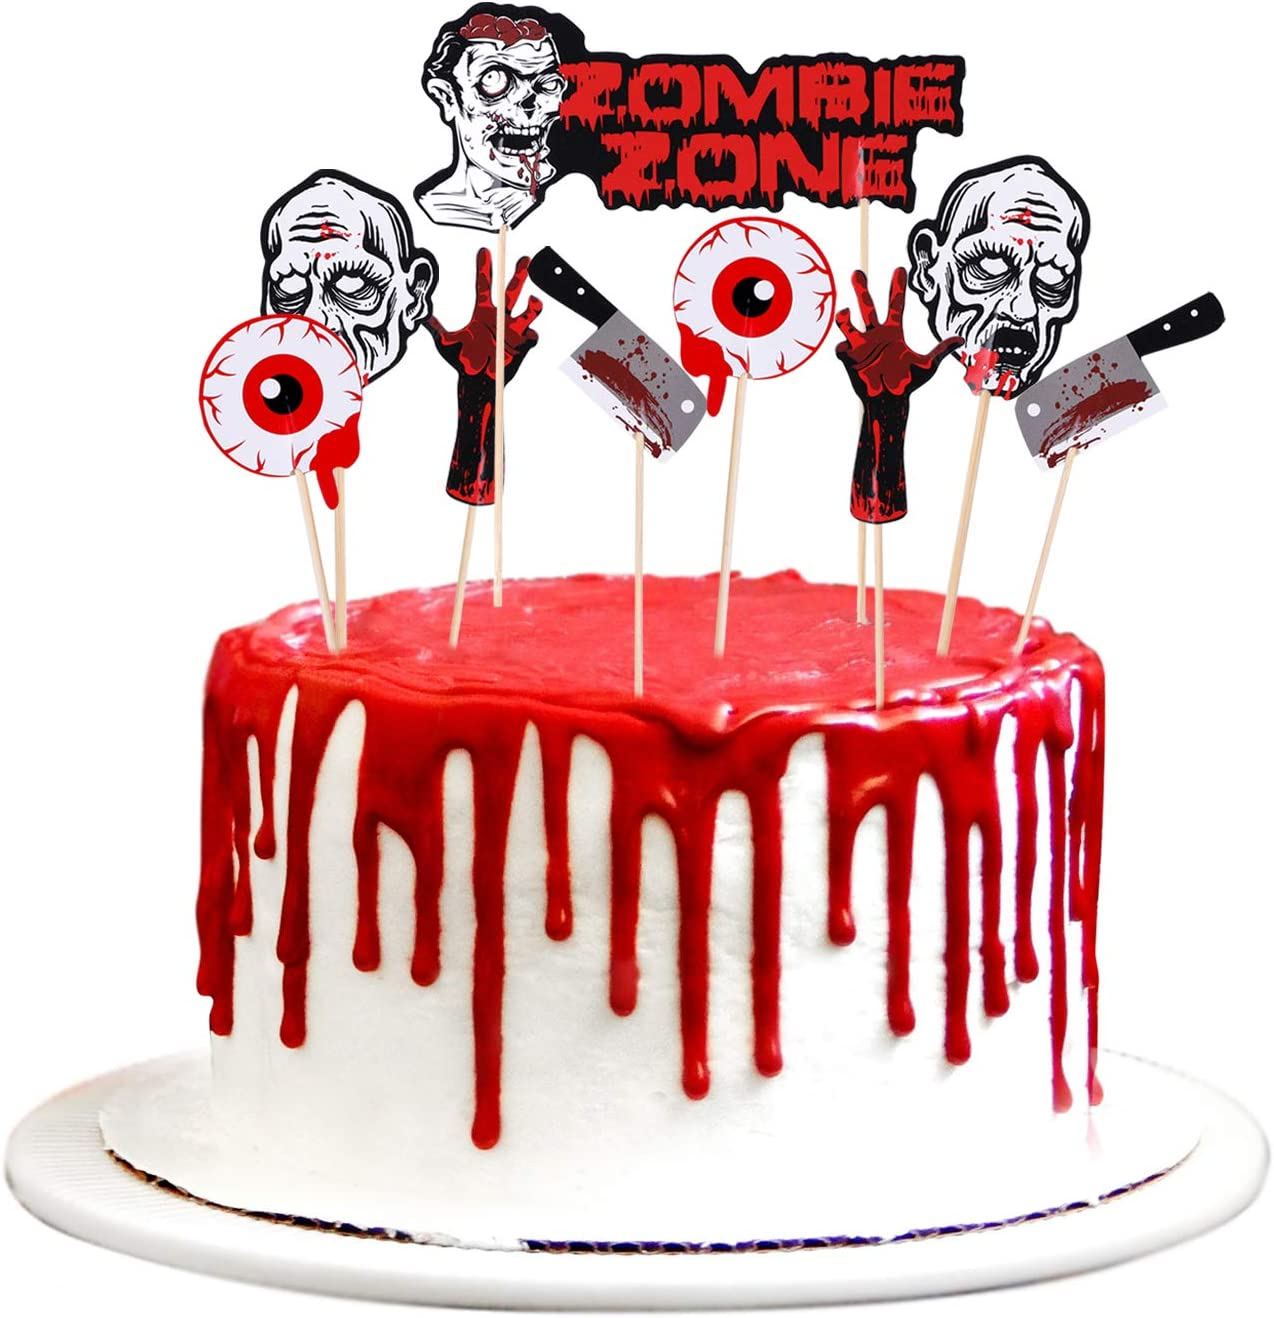 Konsait Halloween Cupcake Toppers Halloween Party Picks Cake Toppers for Halloween Party Favor Supplies Decorations Food Cake Decor (18Pcs)